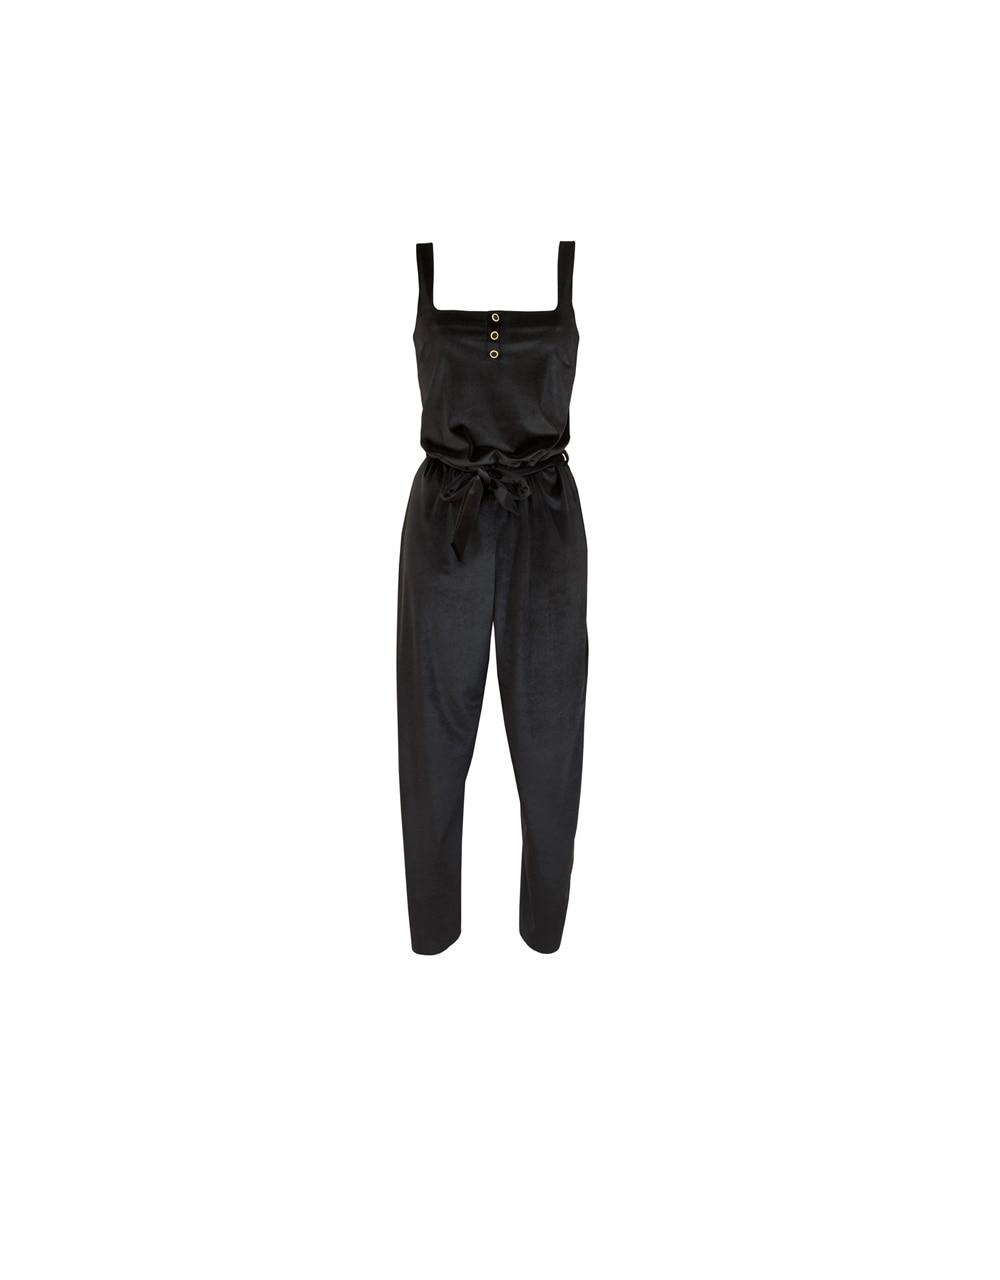 lingerie jumpsuit Charlie velvet Black Storm 59 € Girls In Paris photo 6